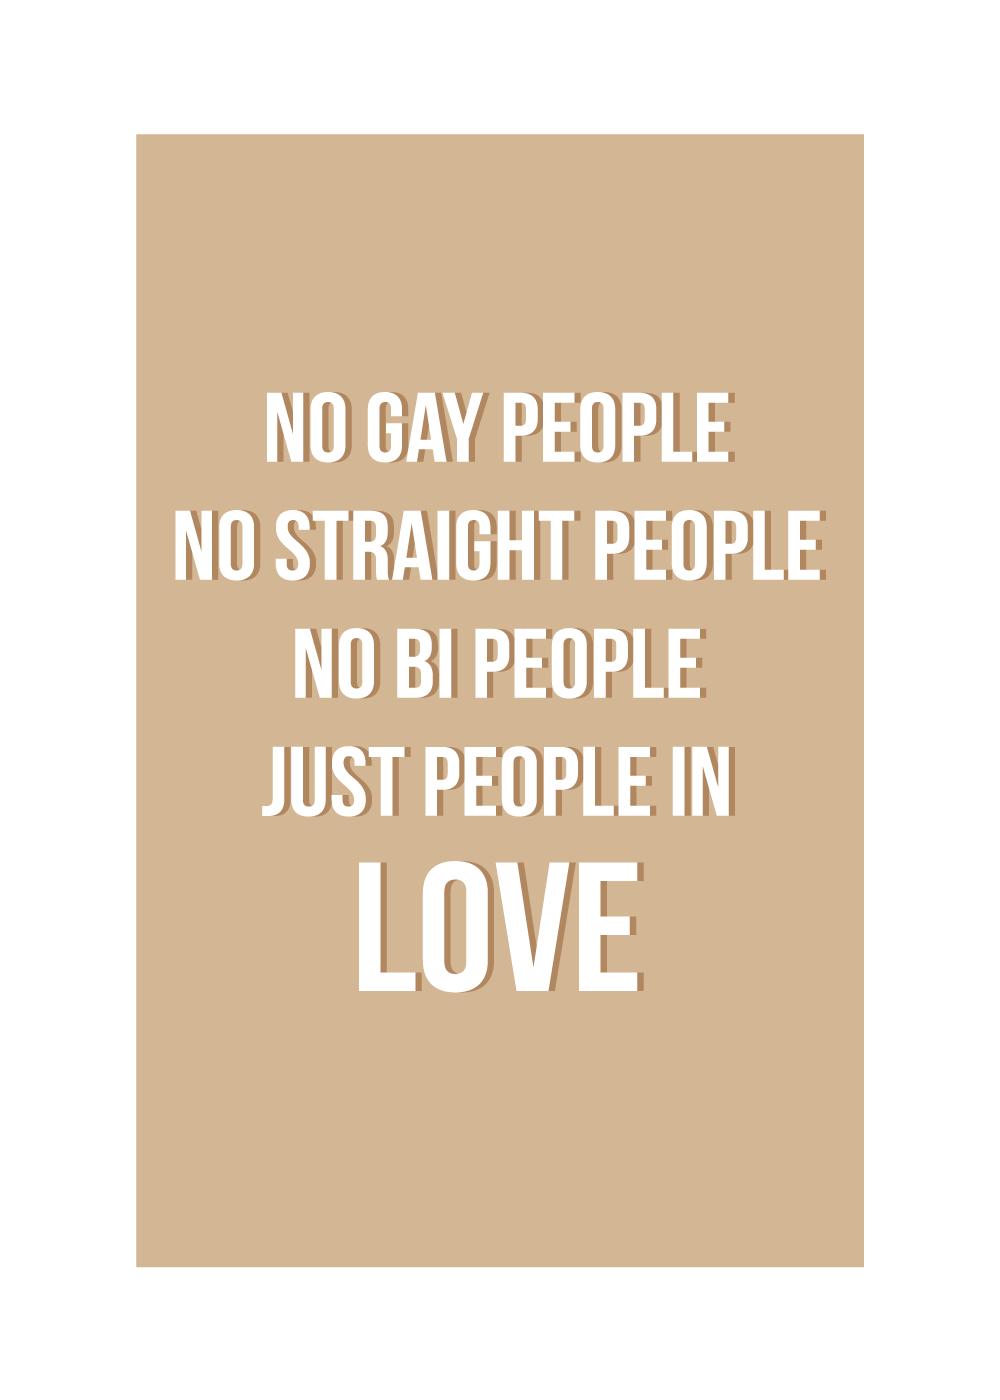 Just people in love - LGBT plakat